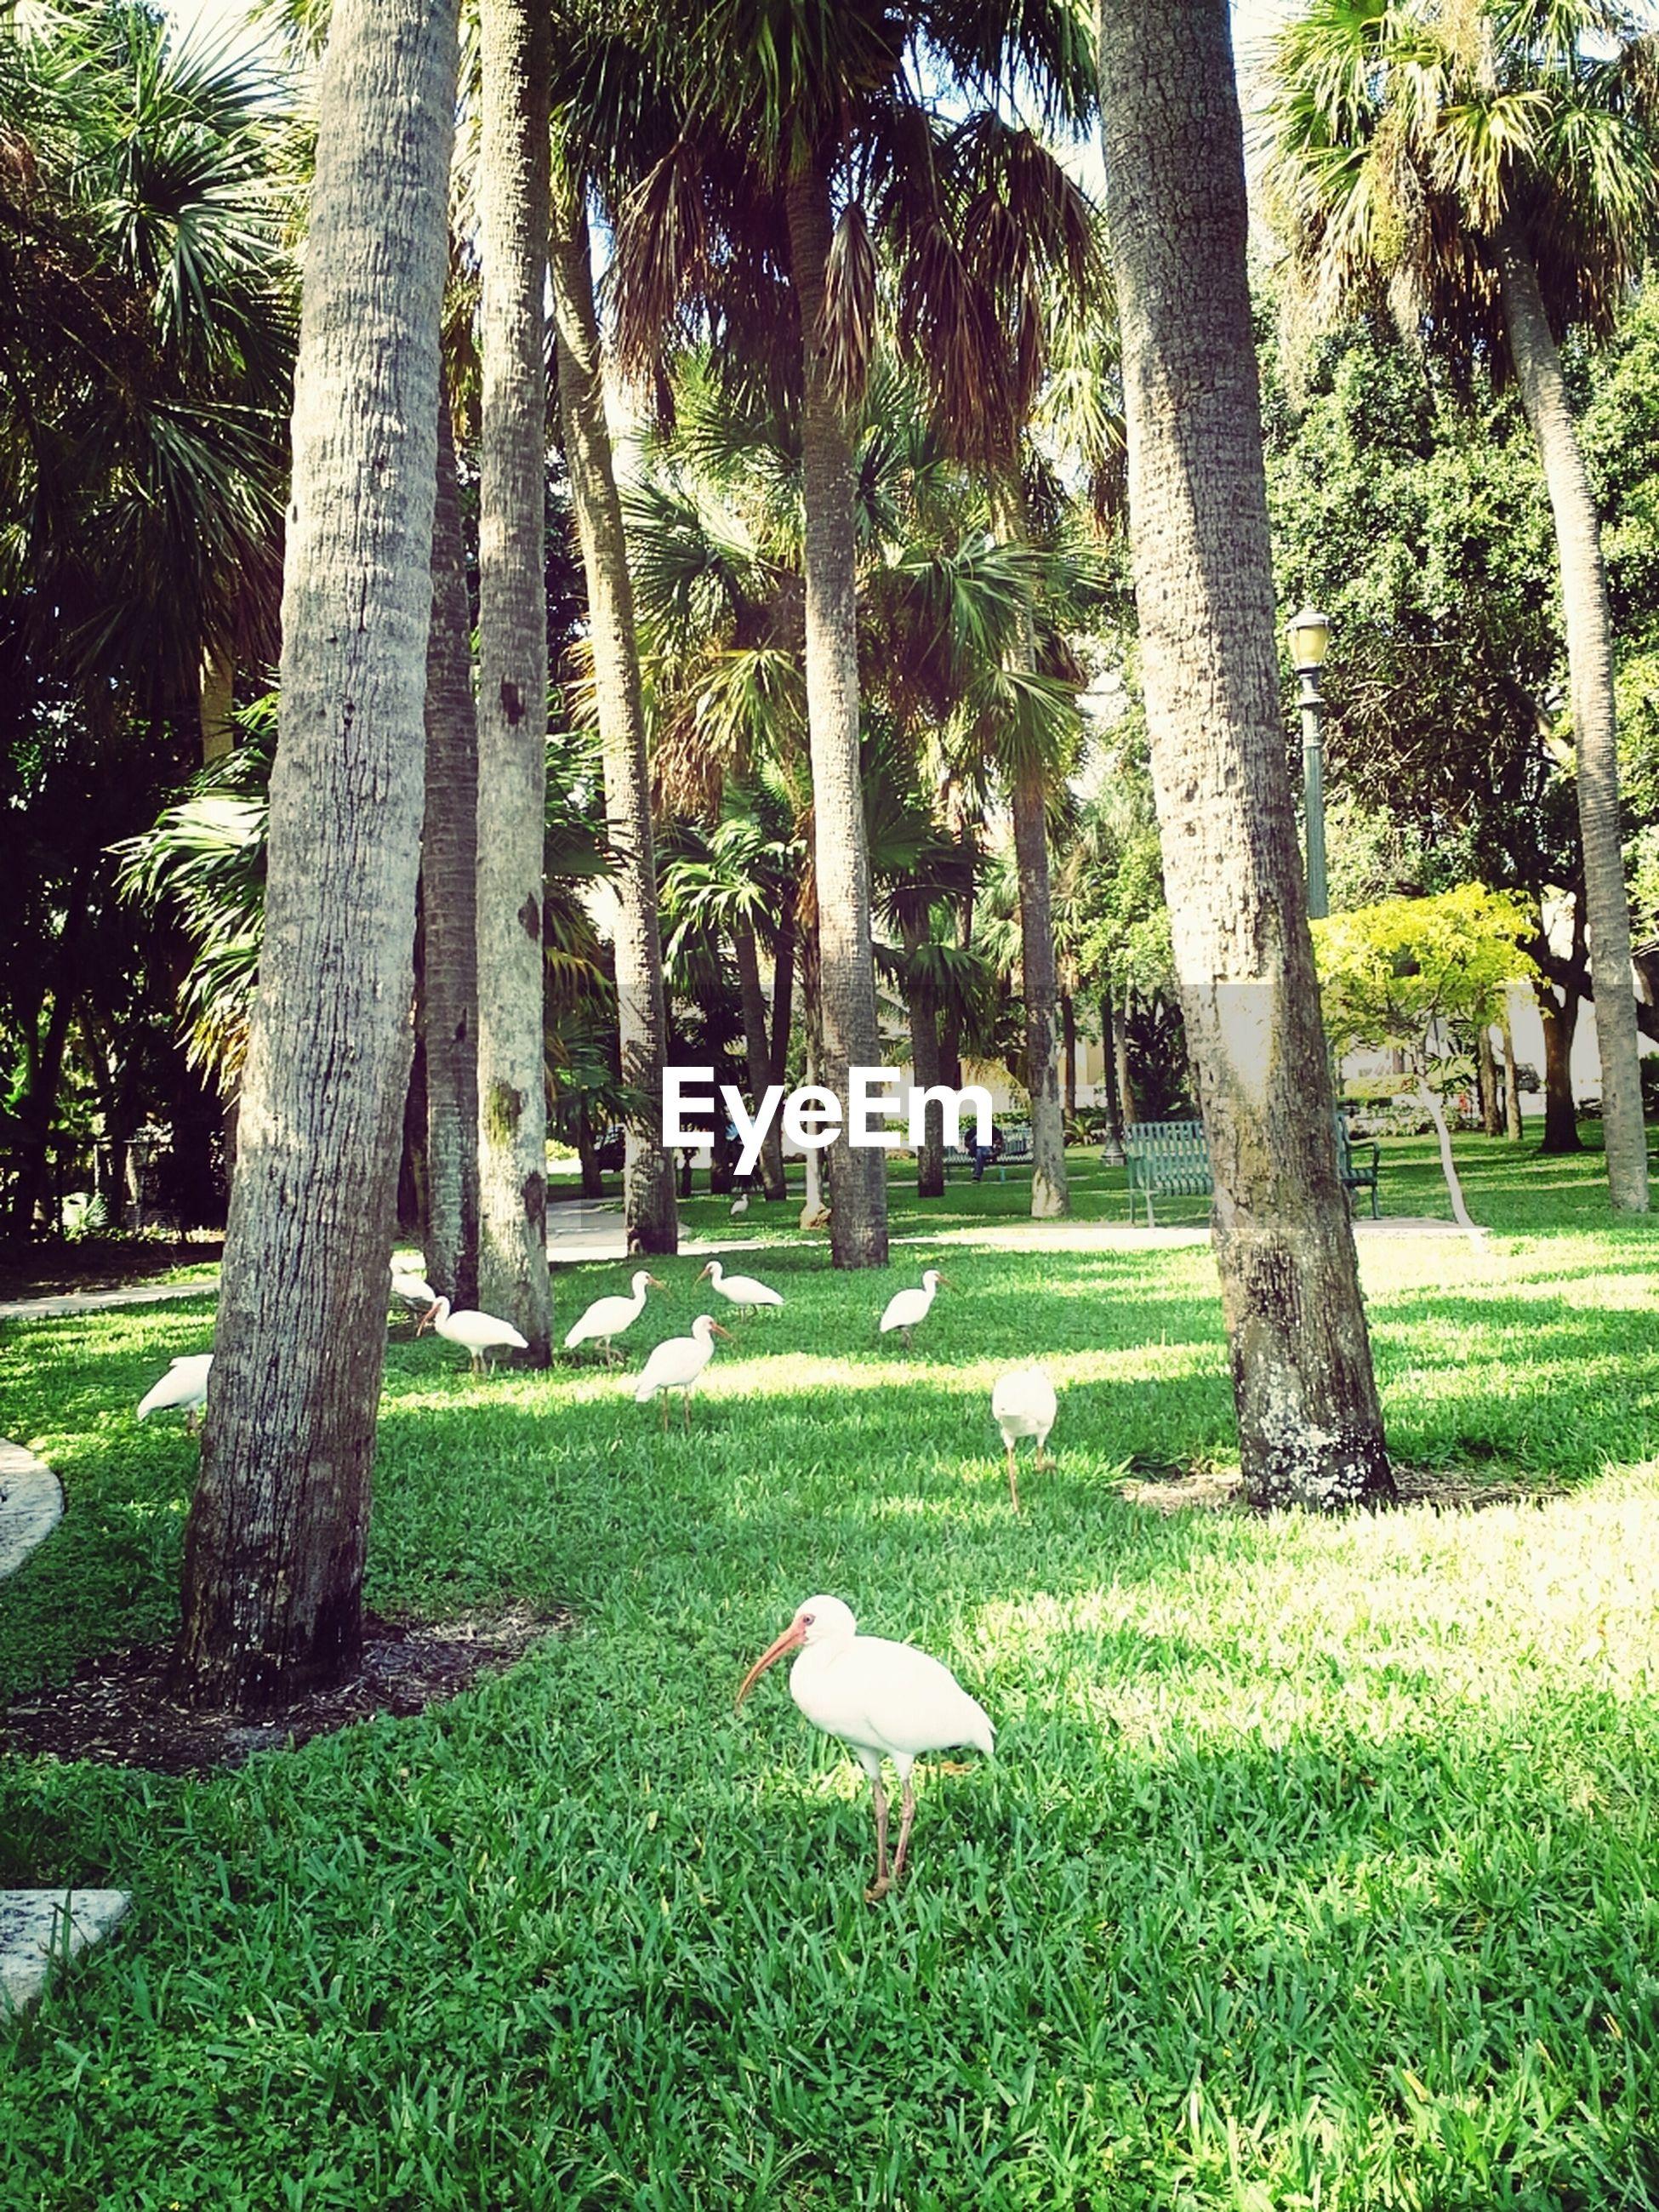 Birds walking among palm trees